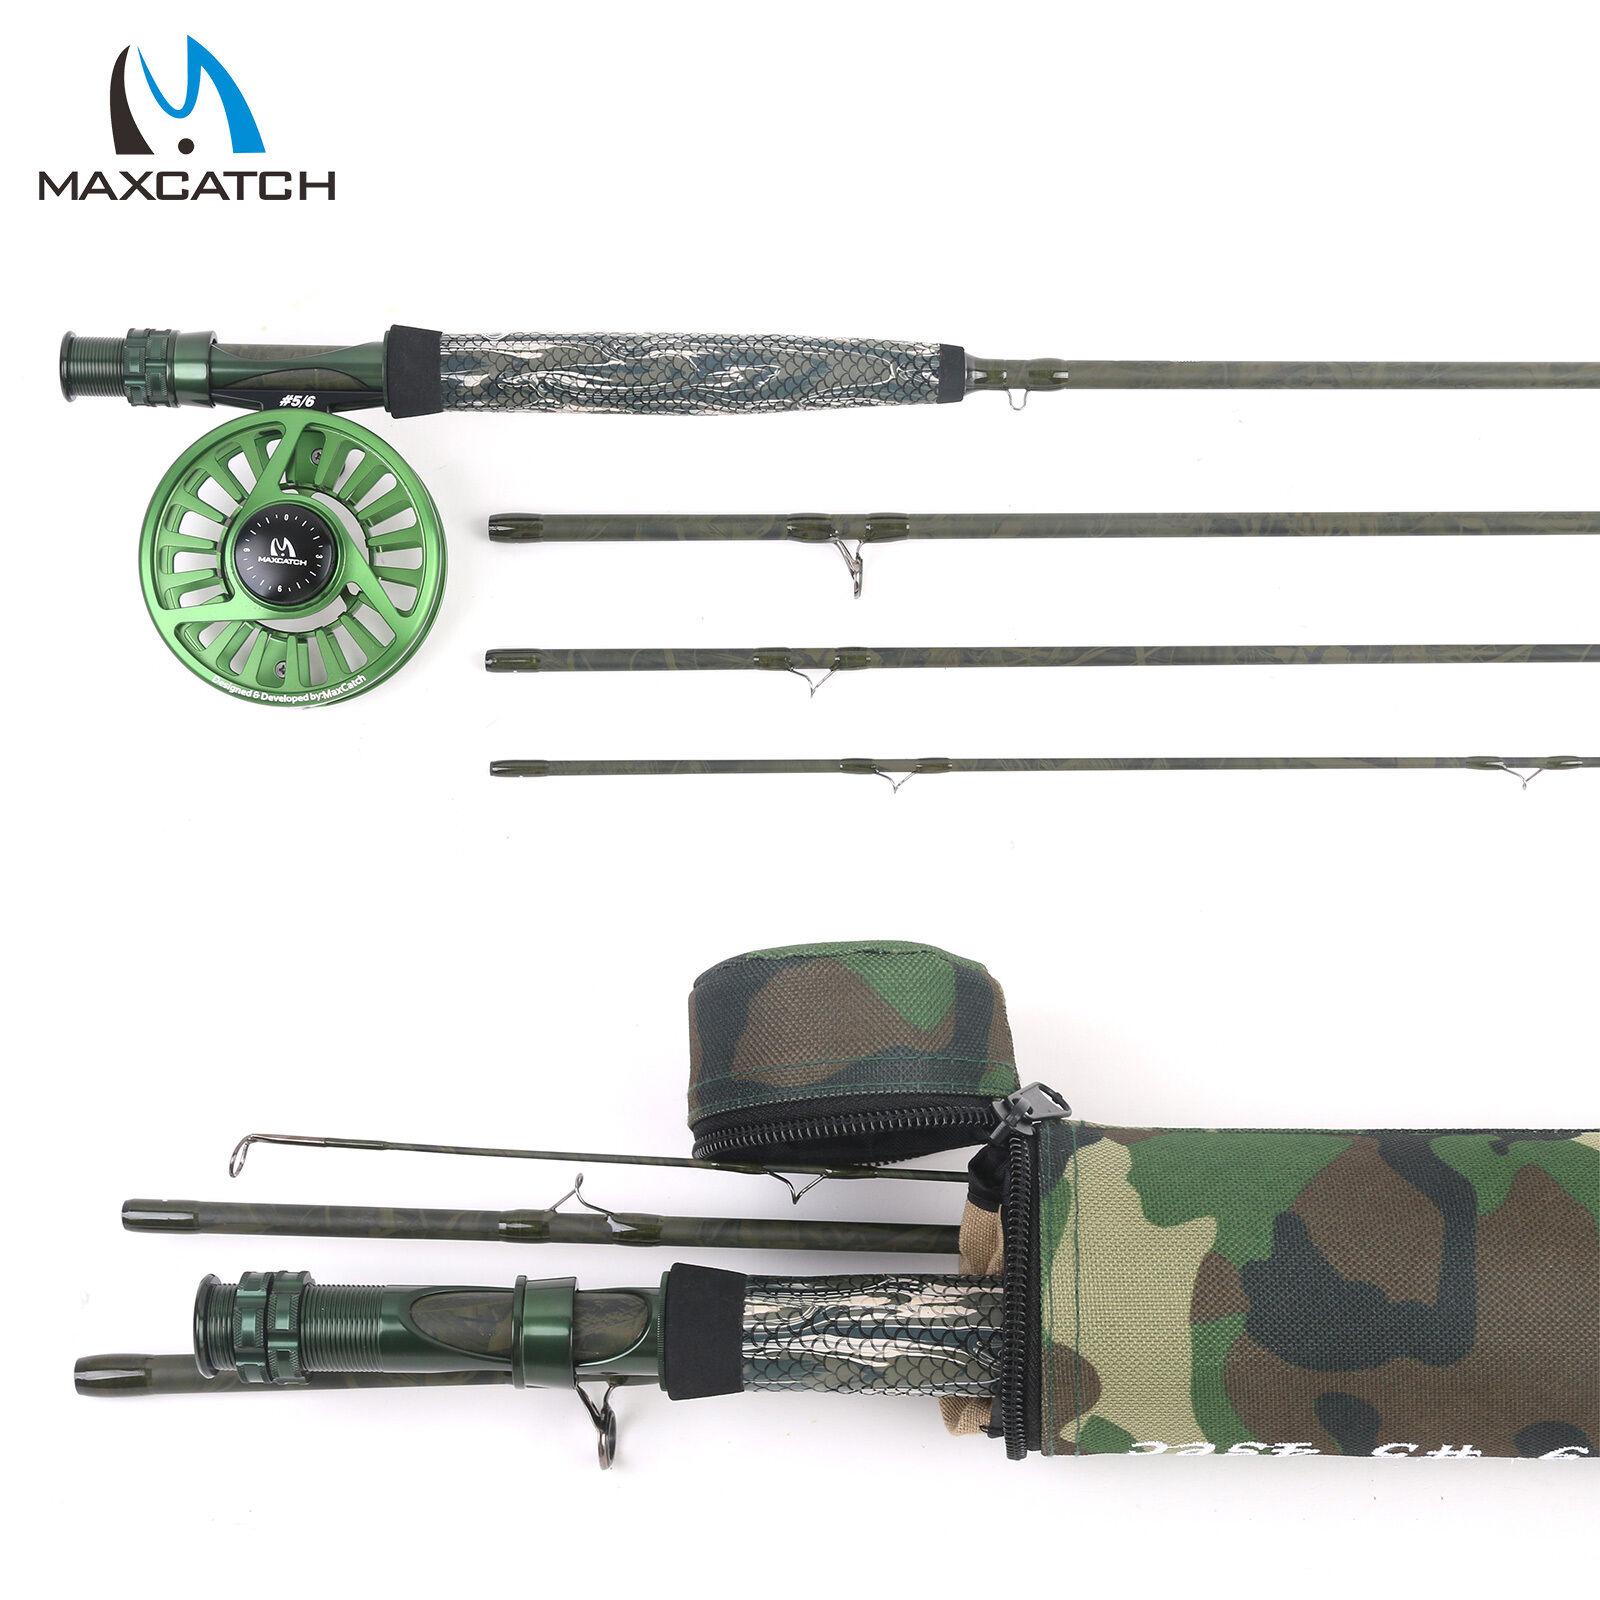 Rod & Cocherete mosca Camo Combo 9' 5WT 4Sec 5 6WT acción rápida Cocherete de pesca con mosca verde